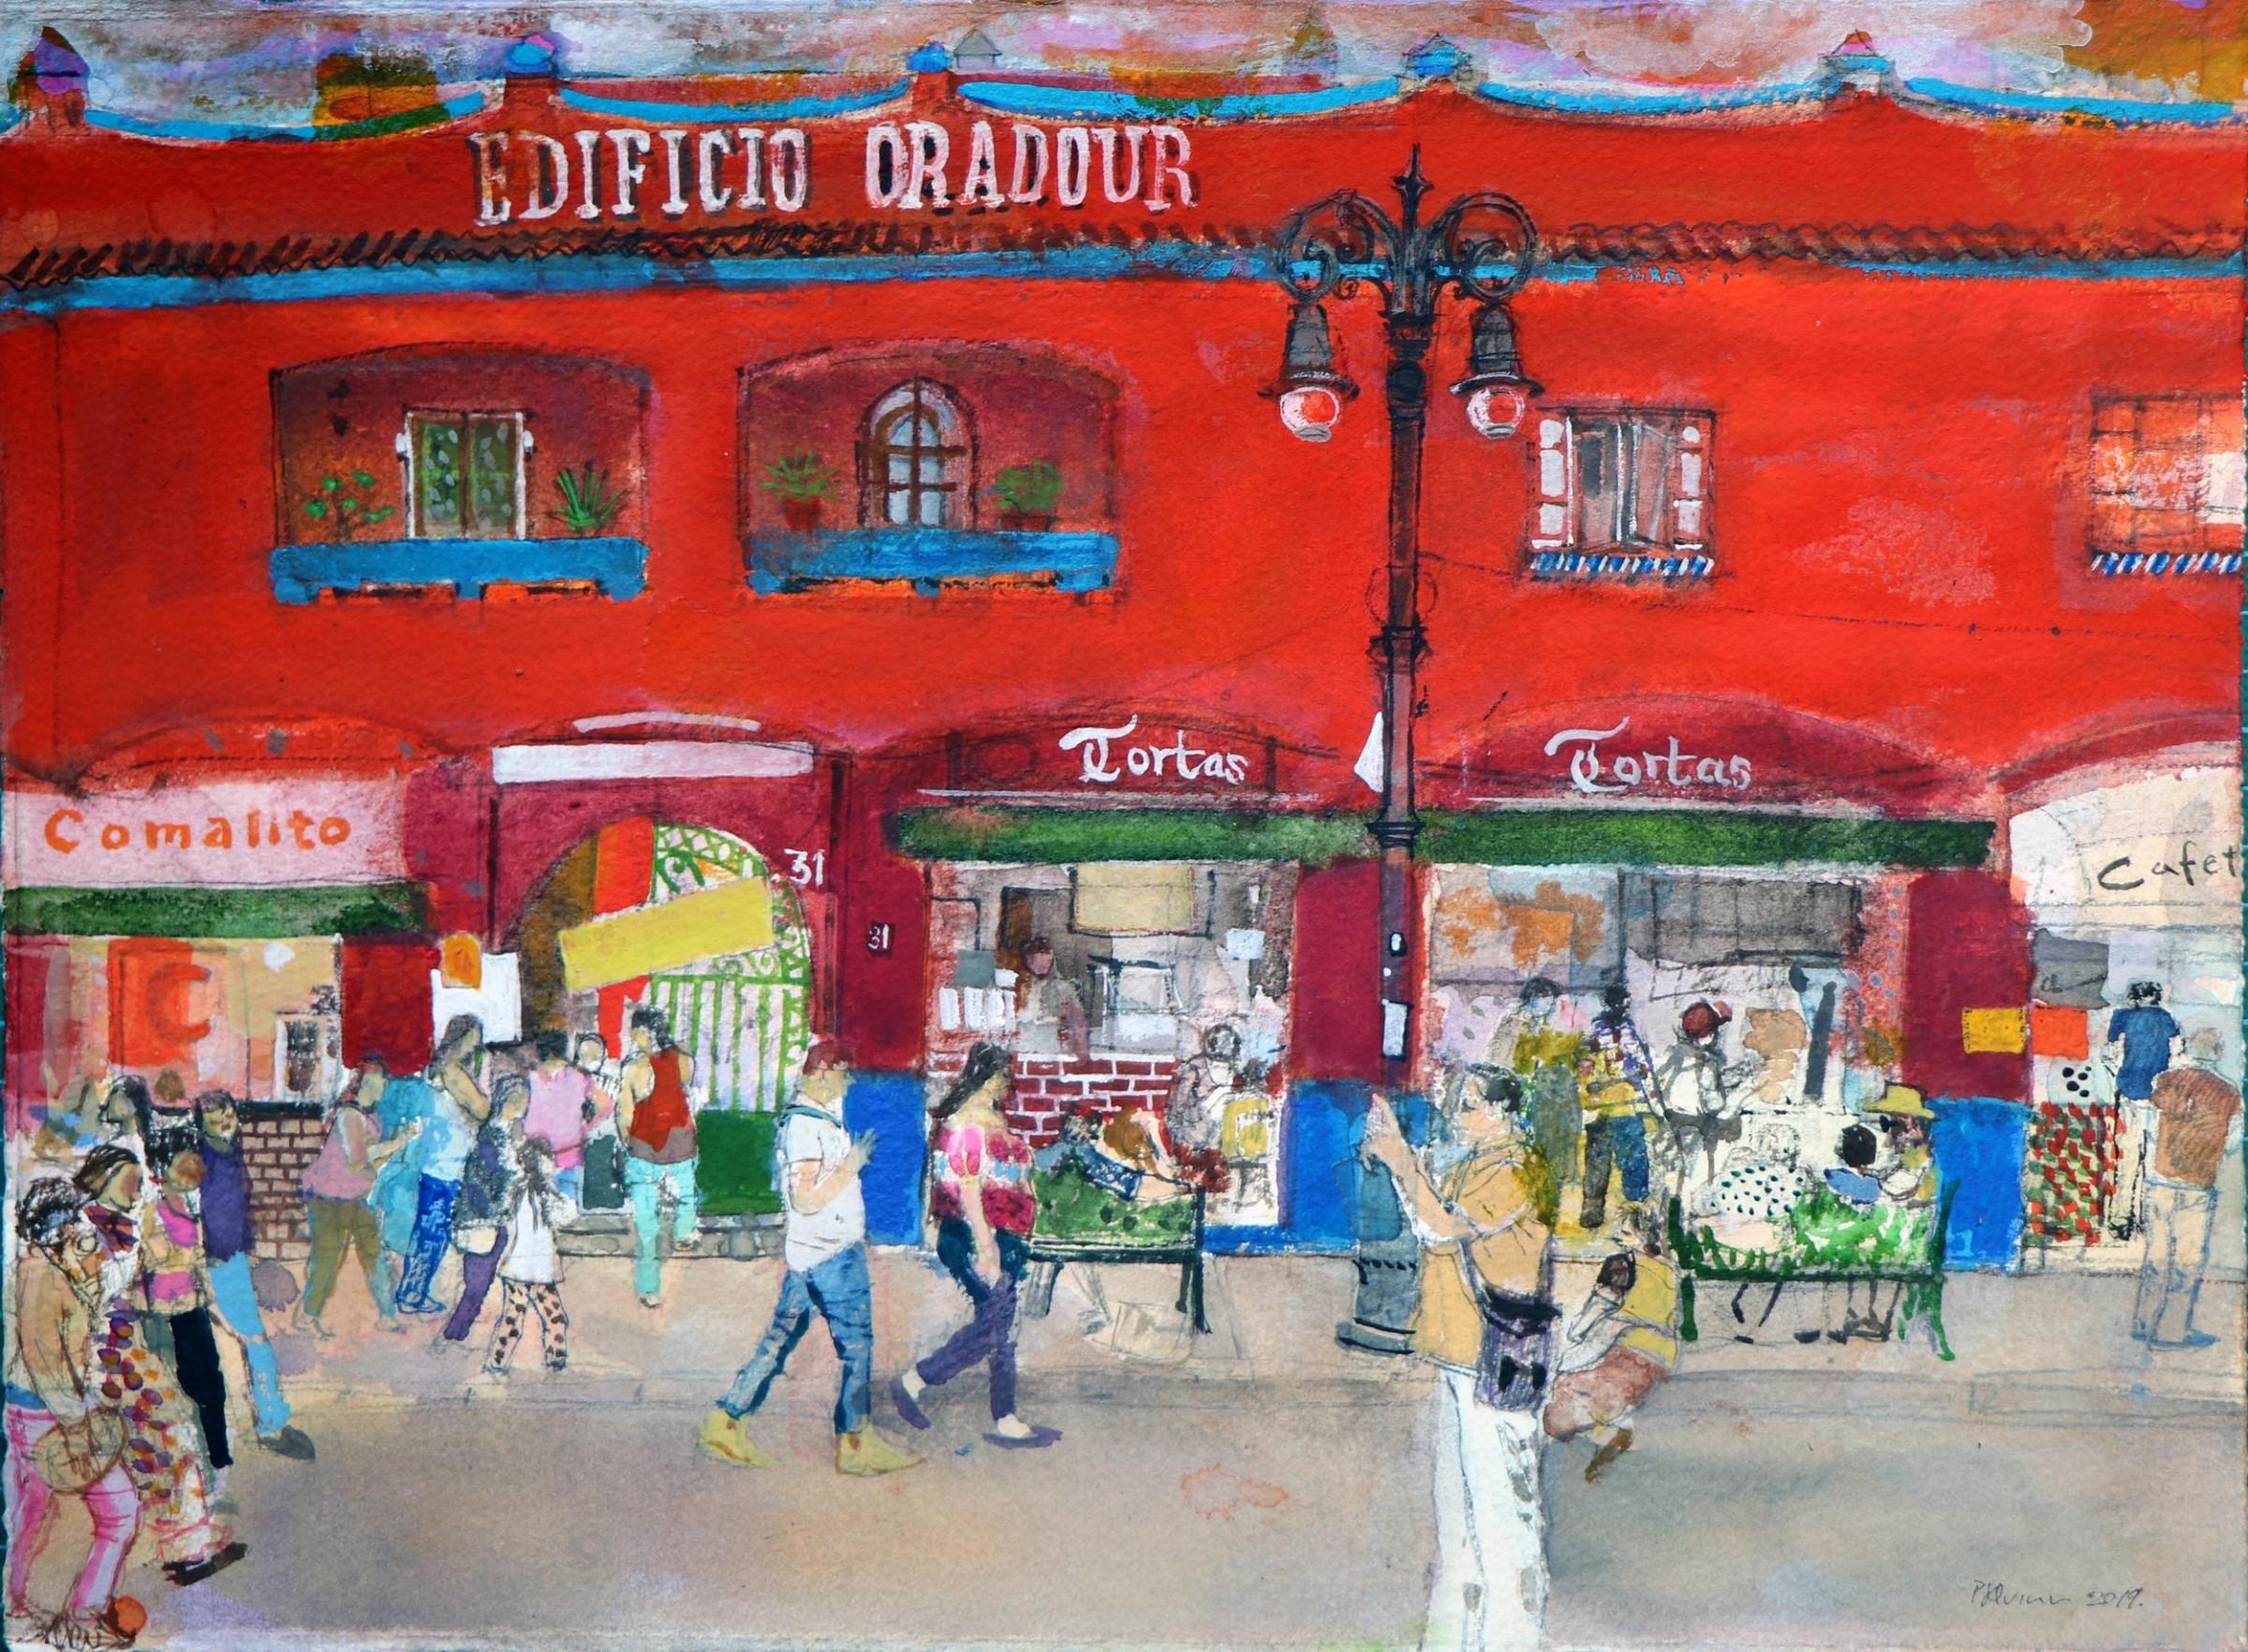 "<span class=""link fancybox-details-link""><a href=""/artists/96-peter-quinn/works/12150-peter-quinn-edificio-oradour-coyoacan-mexico-city/"">View Detail Page</a></span><div class=""artist""><span class=""artist""><strong>Peter Quinn</strong></span></div><div class=""title""><em>Edificio Oradour, Coyoacán, Mexico City</em></div><div class=""medium"">watercolour</div><div class=""dimensions"">Frame: 50 x 58 cm<br /> Artwork: 28 x 38 cm</div><div class=""price"">£510.00</div>"